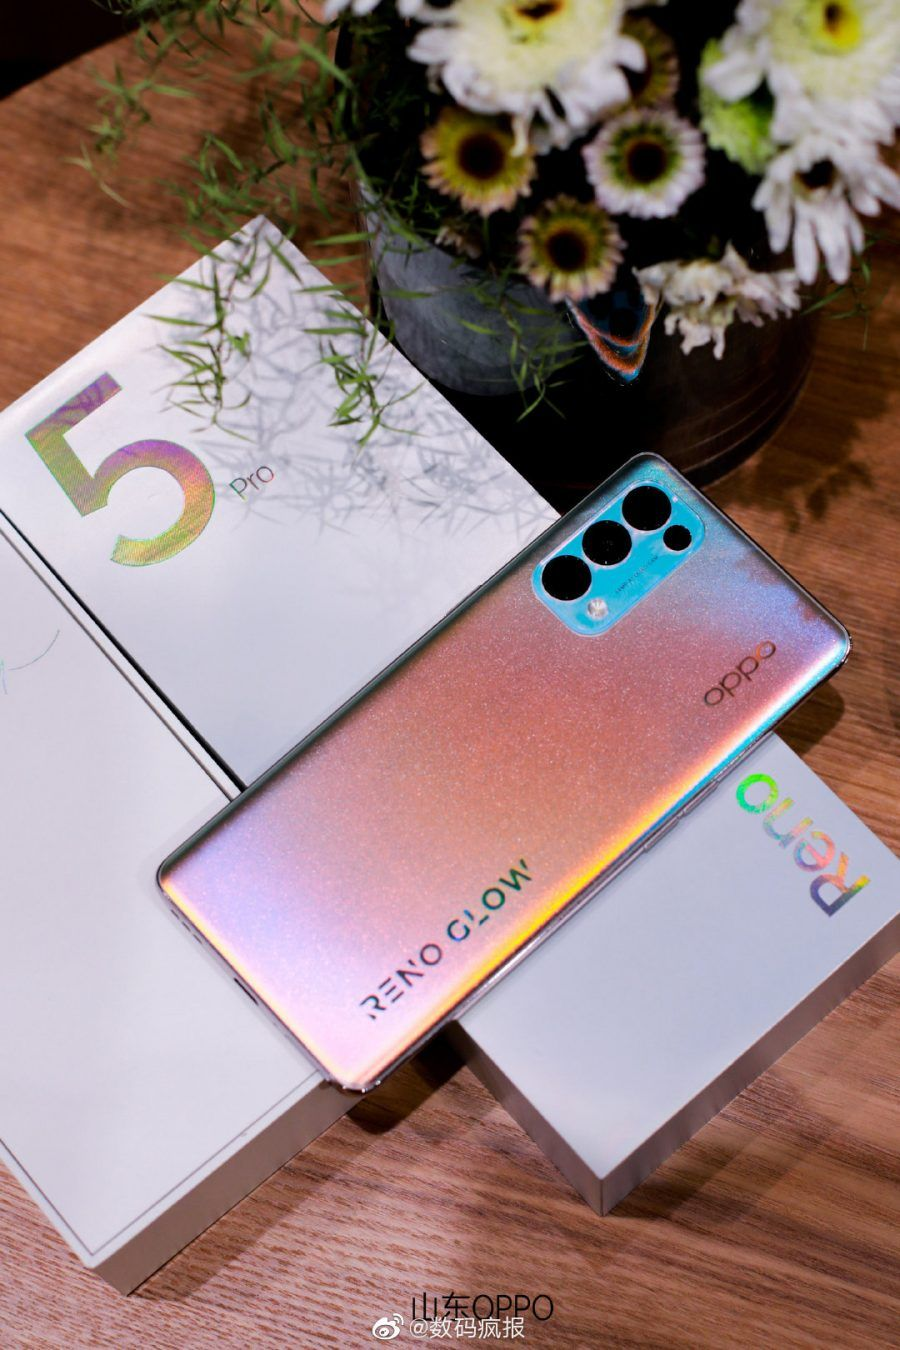 Reno5Pro 5 Android 11, china, gama-média, imagens reais, oppo, OPPO Reno 5, Reno 5 Pro, smartphone, topo de gama